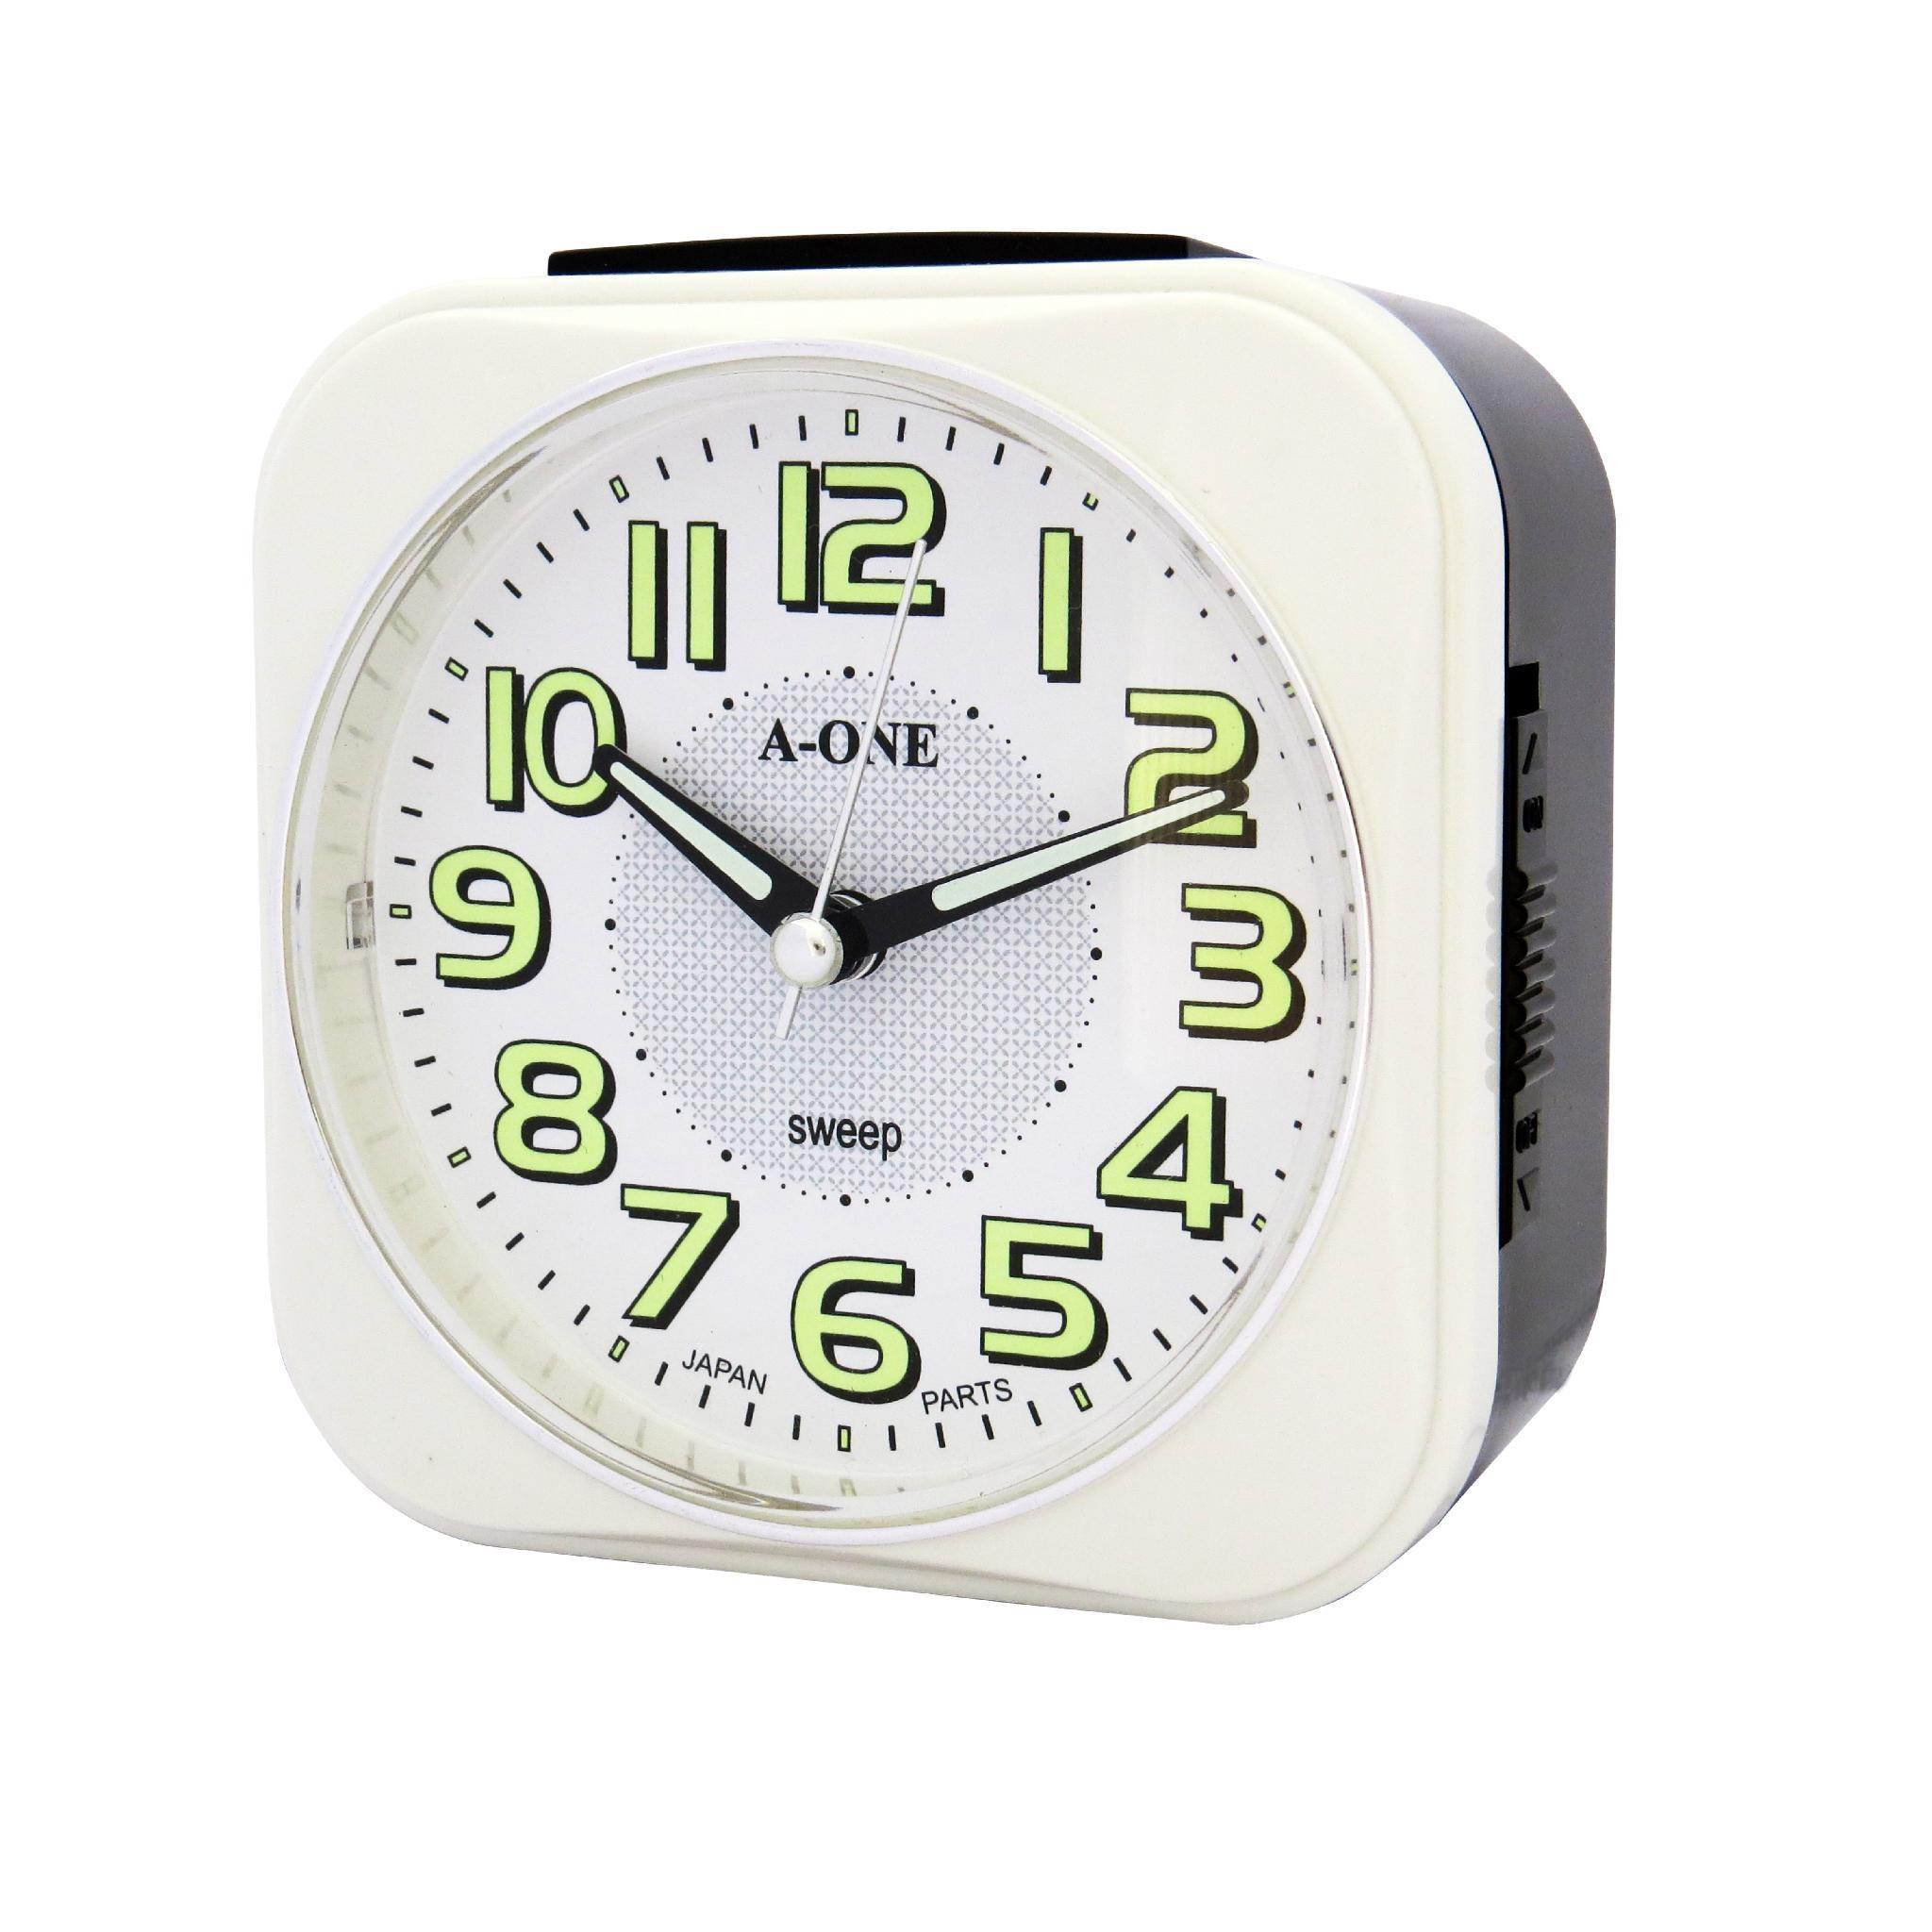 TG-0160 大聲公超級夜光數字鬧鐘 2